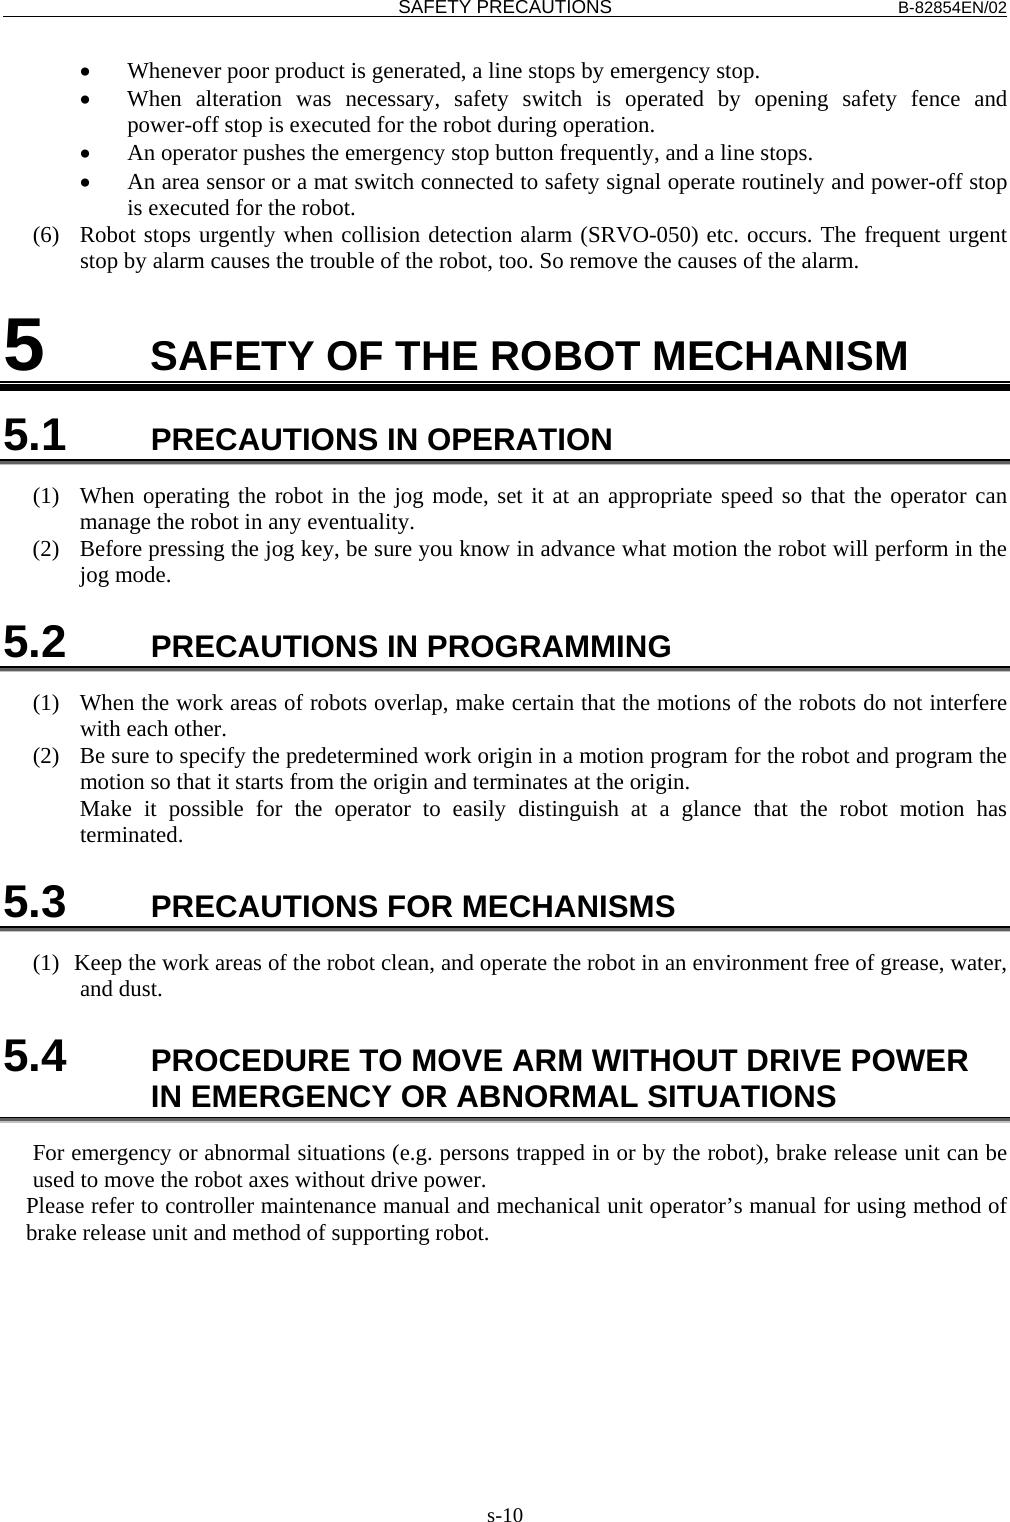 FANUC Robot Series R 30iA/R 30iA Mate/R 30iB CONTROLLER